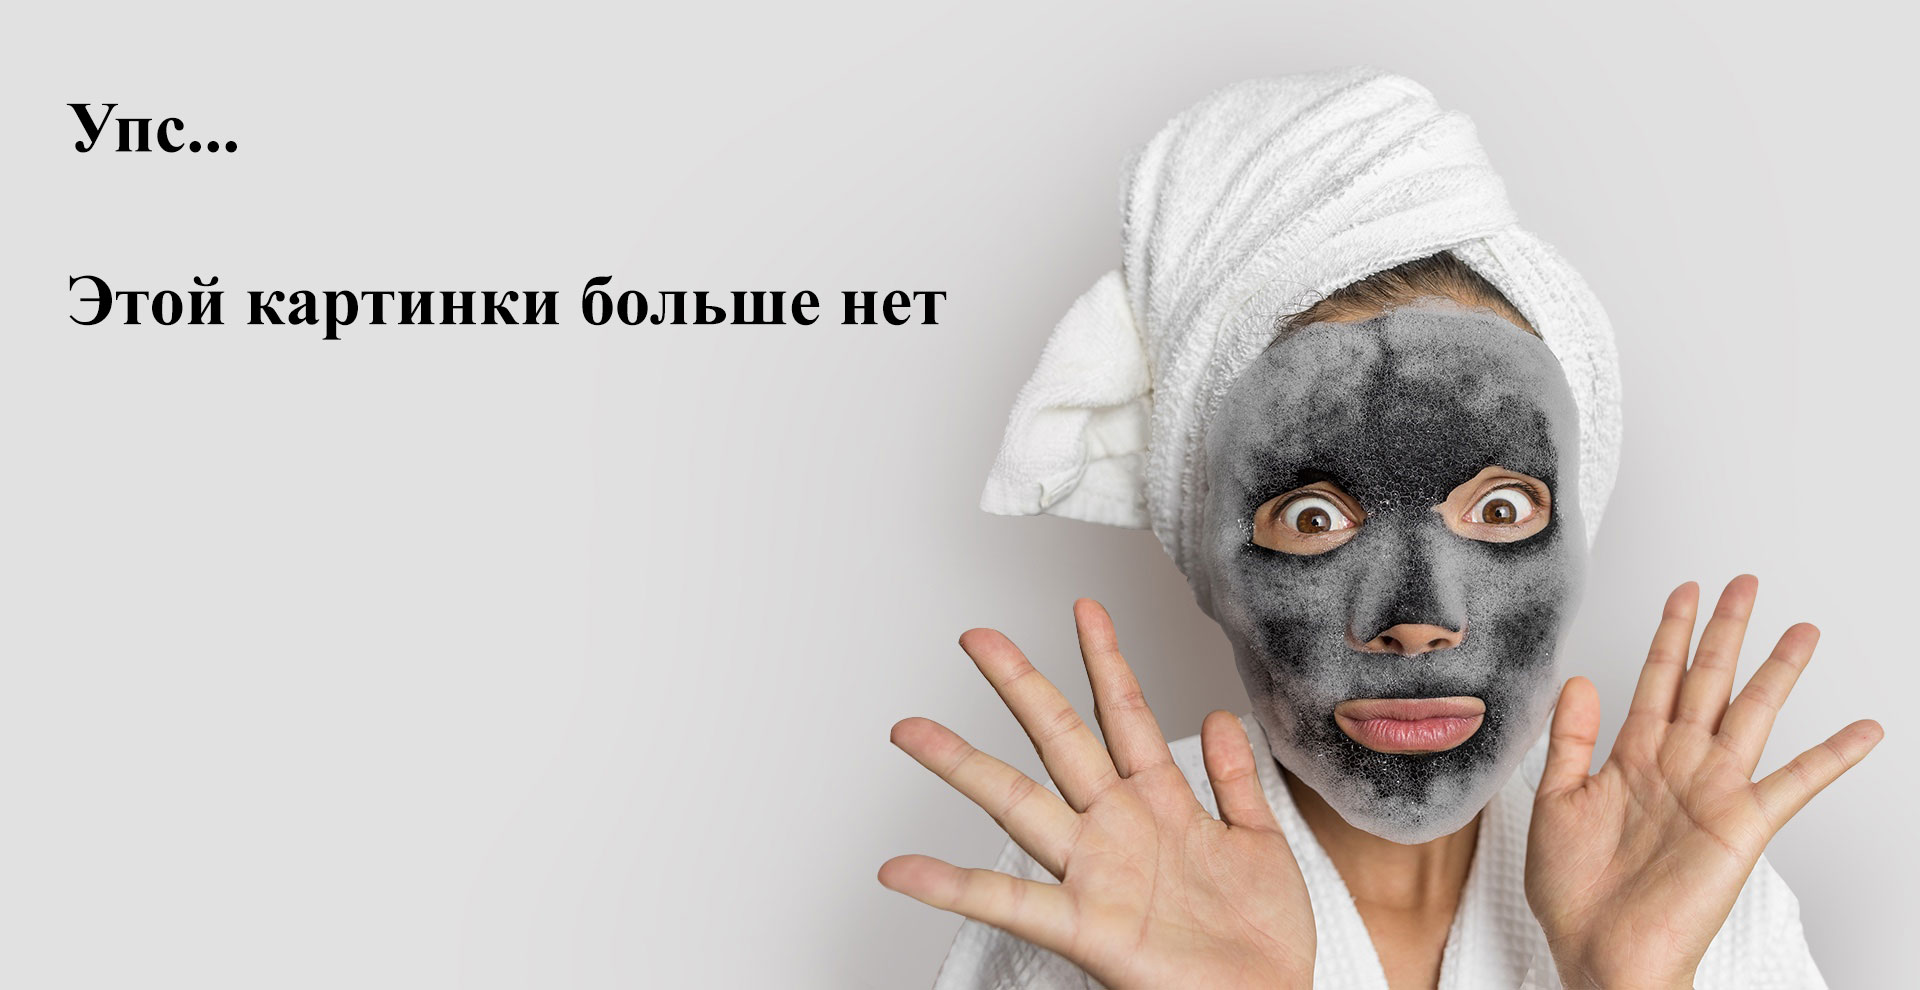 Italwax, Воск Flex «Янтарь», 800 мл